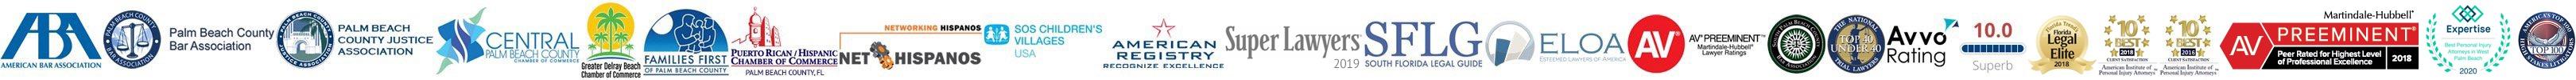 Legal Accolade